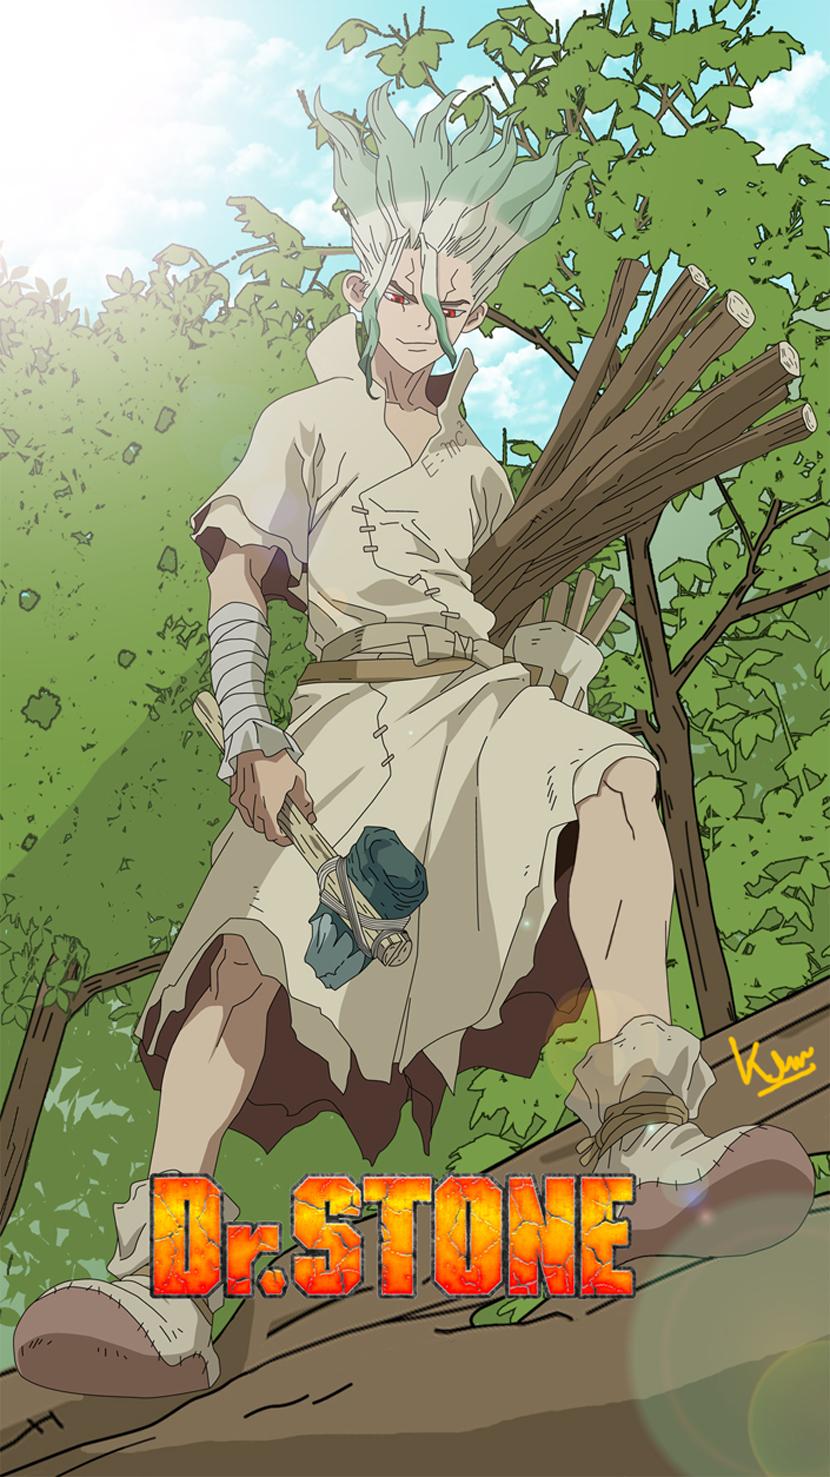 Wallpaper Dr Stone Senkuu Ishigami Anime Boys Fan Art Poster Artwork Anime Man 830x1477 Koreoxy 1758833 Hd Wallpapers Wallhere